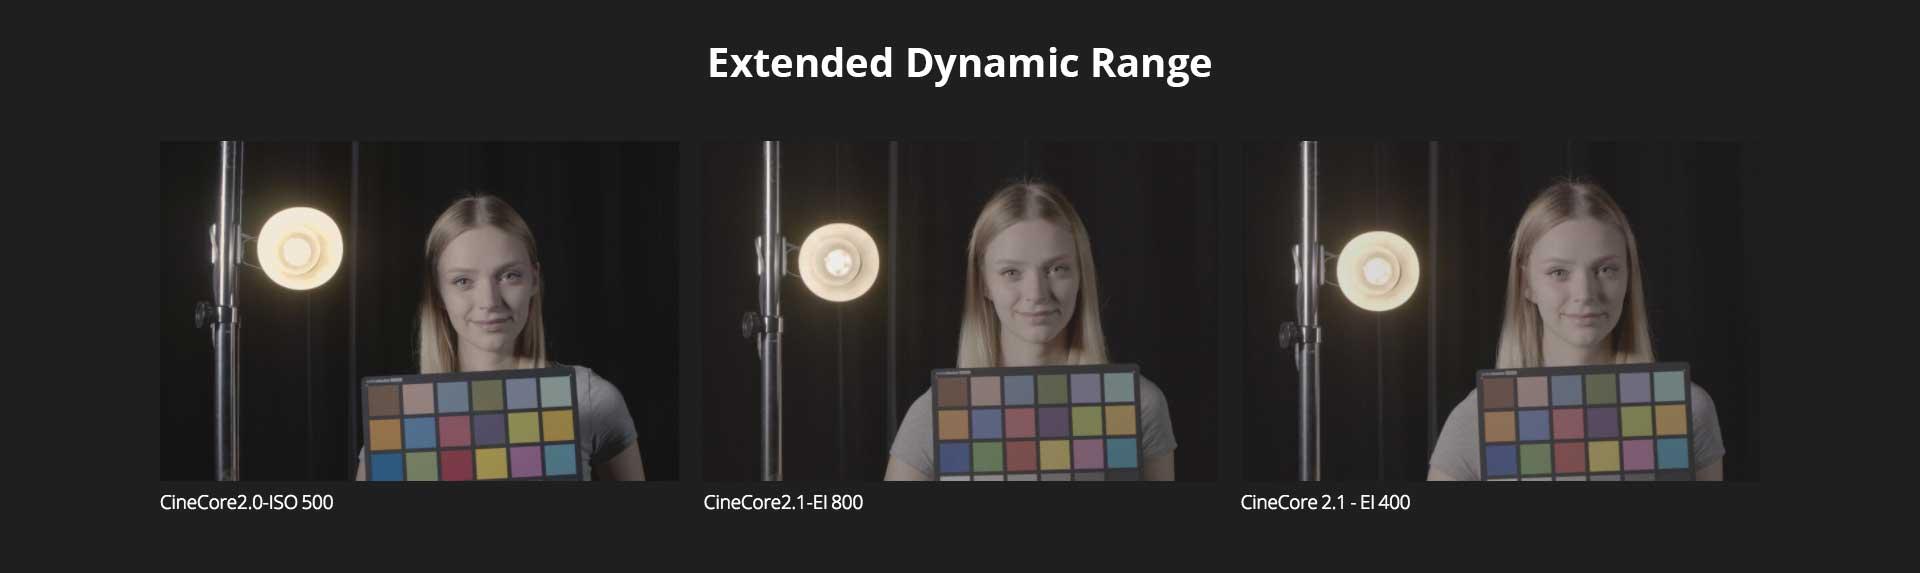 DJI Zenmuse X7 Extended Dynamic Range